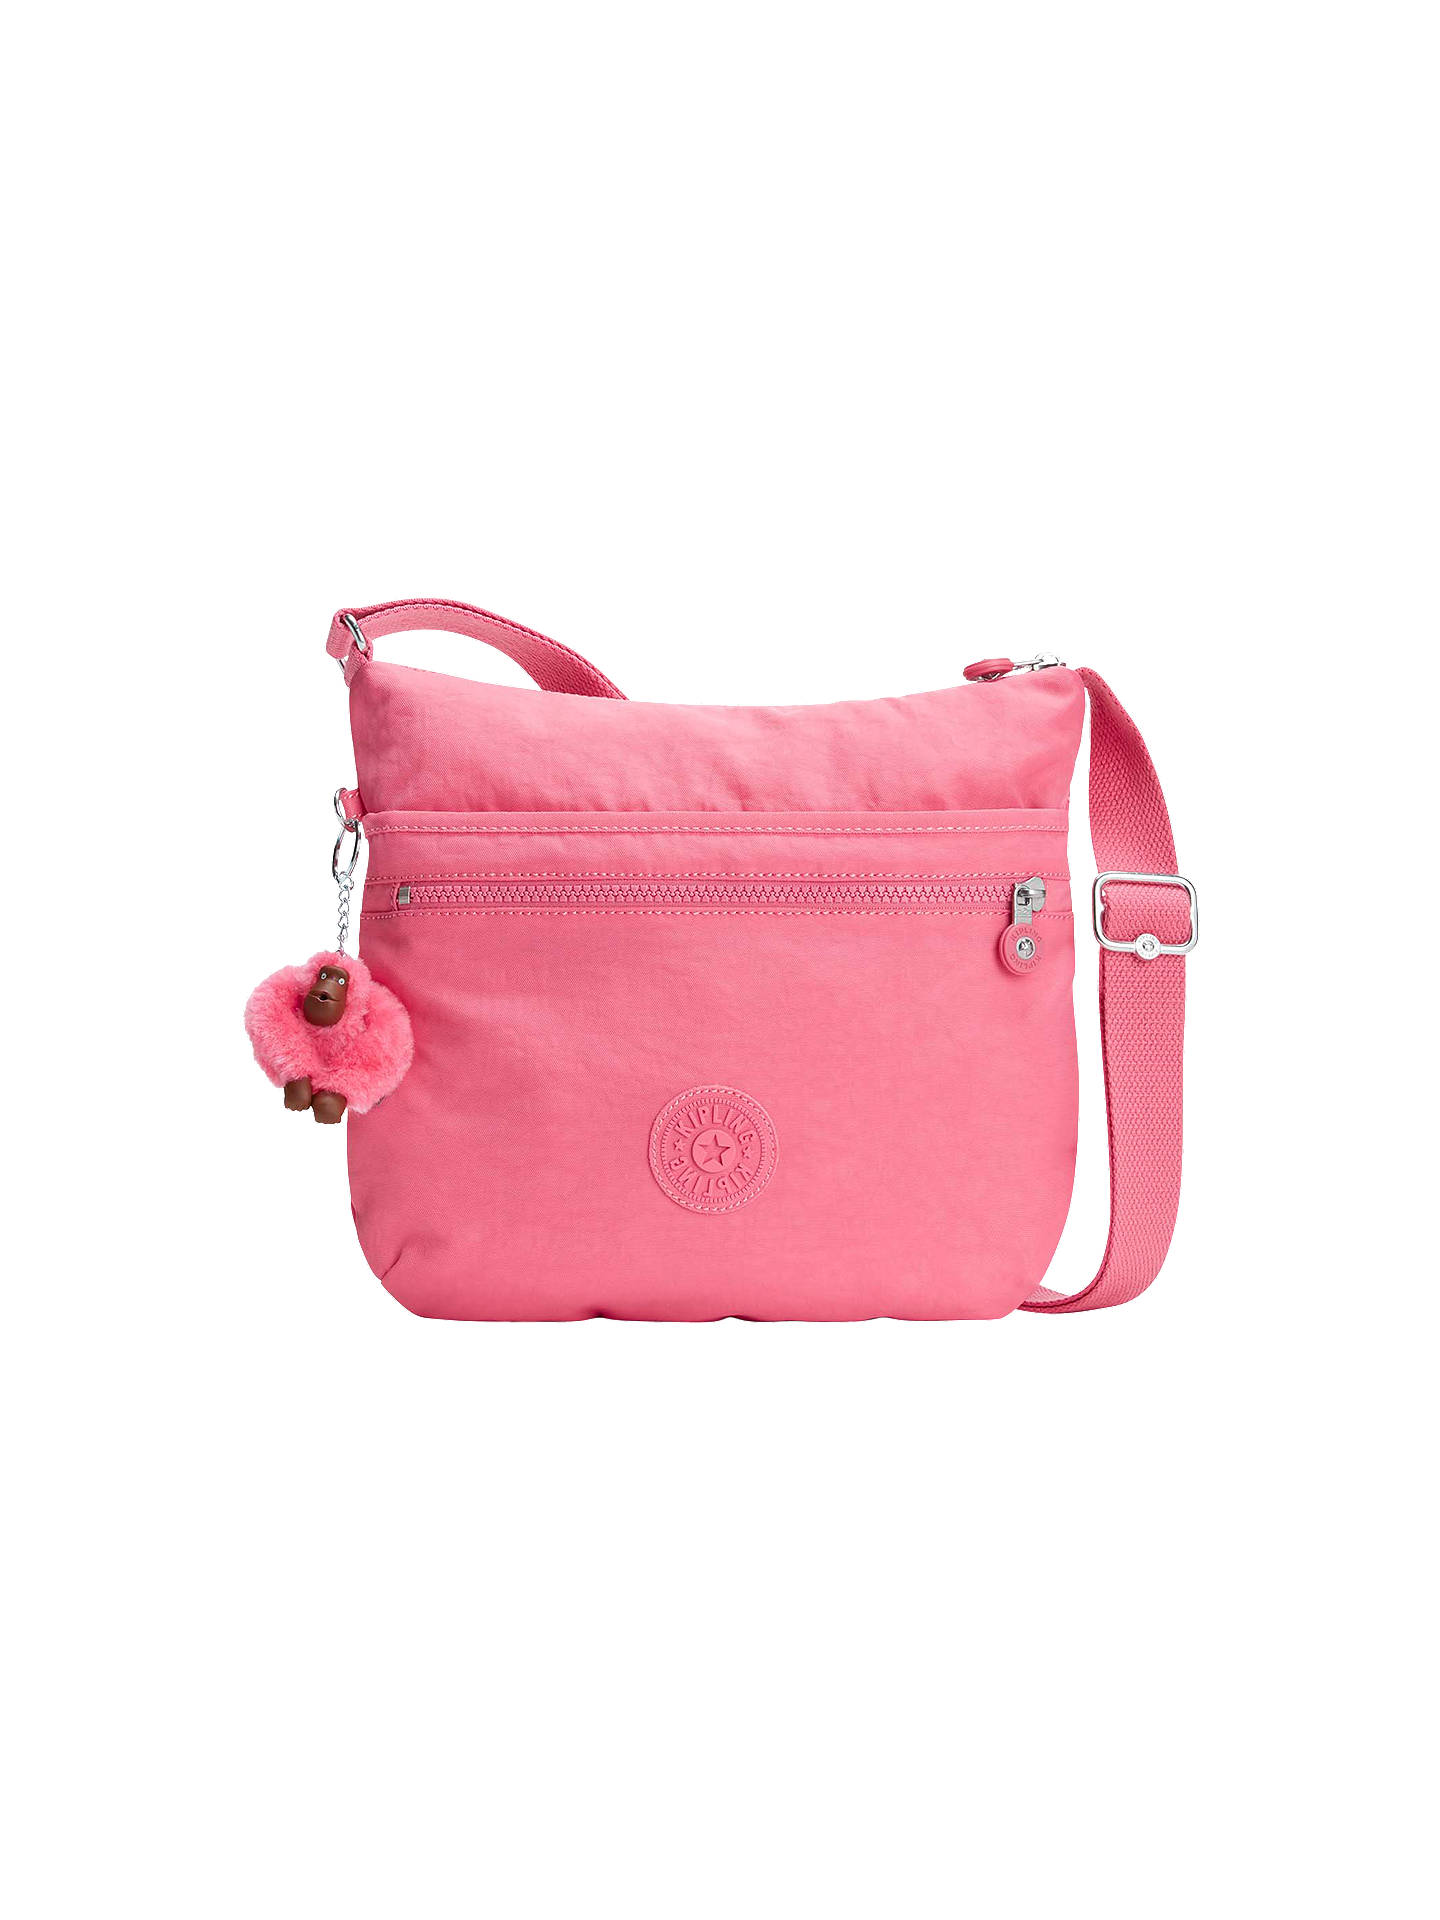 befac3e2343 Buy Kipling Arto Cross Body Bag, City Pink Online at johnlewis.com ...